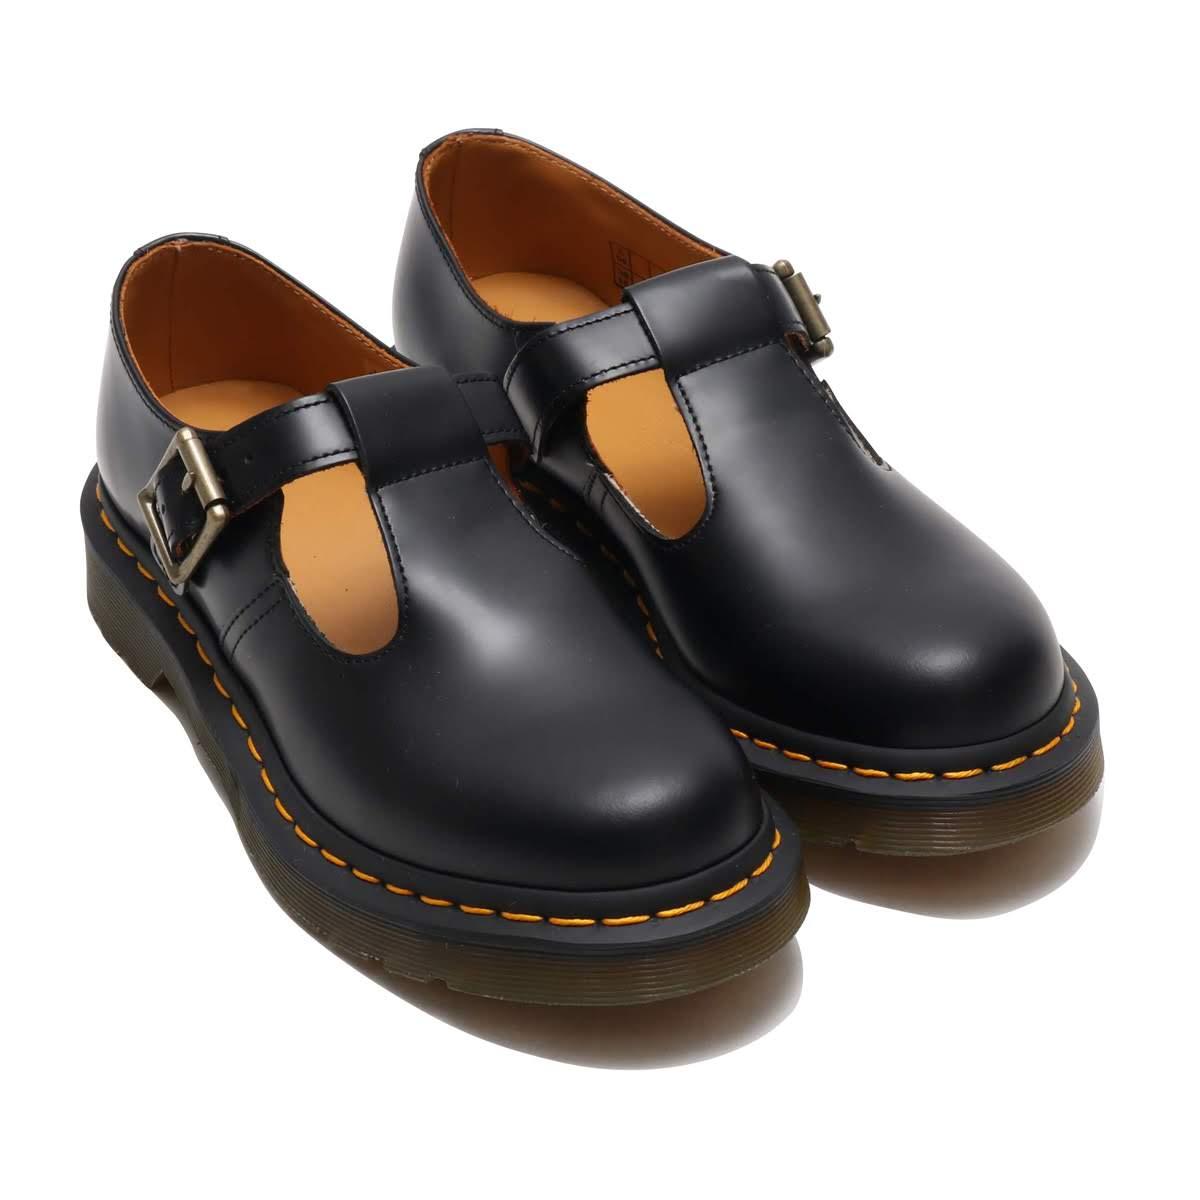 Dr.Martens Polley Black Smooth (ドクターマーチン ポリー ブラックスムース)BLACK【メンズ レディース ブーツ】18FW-I